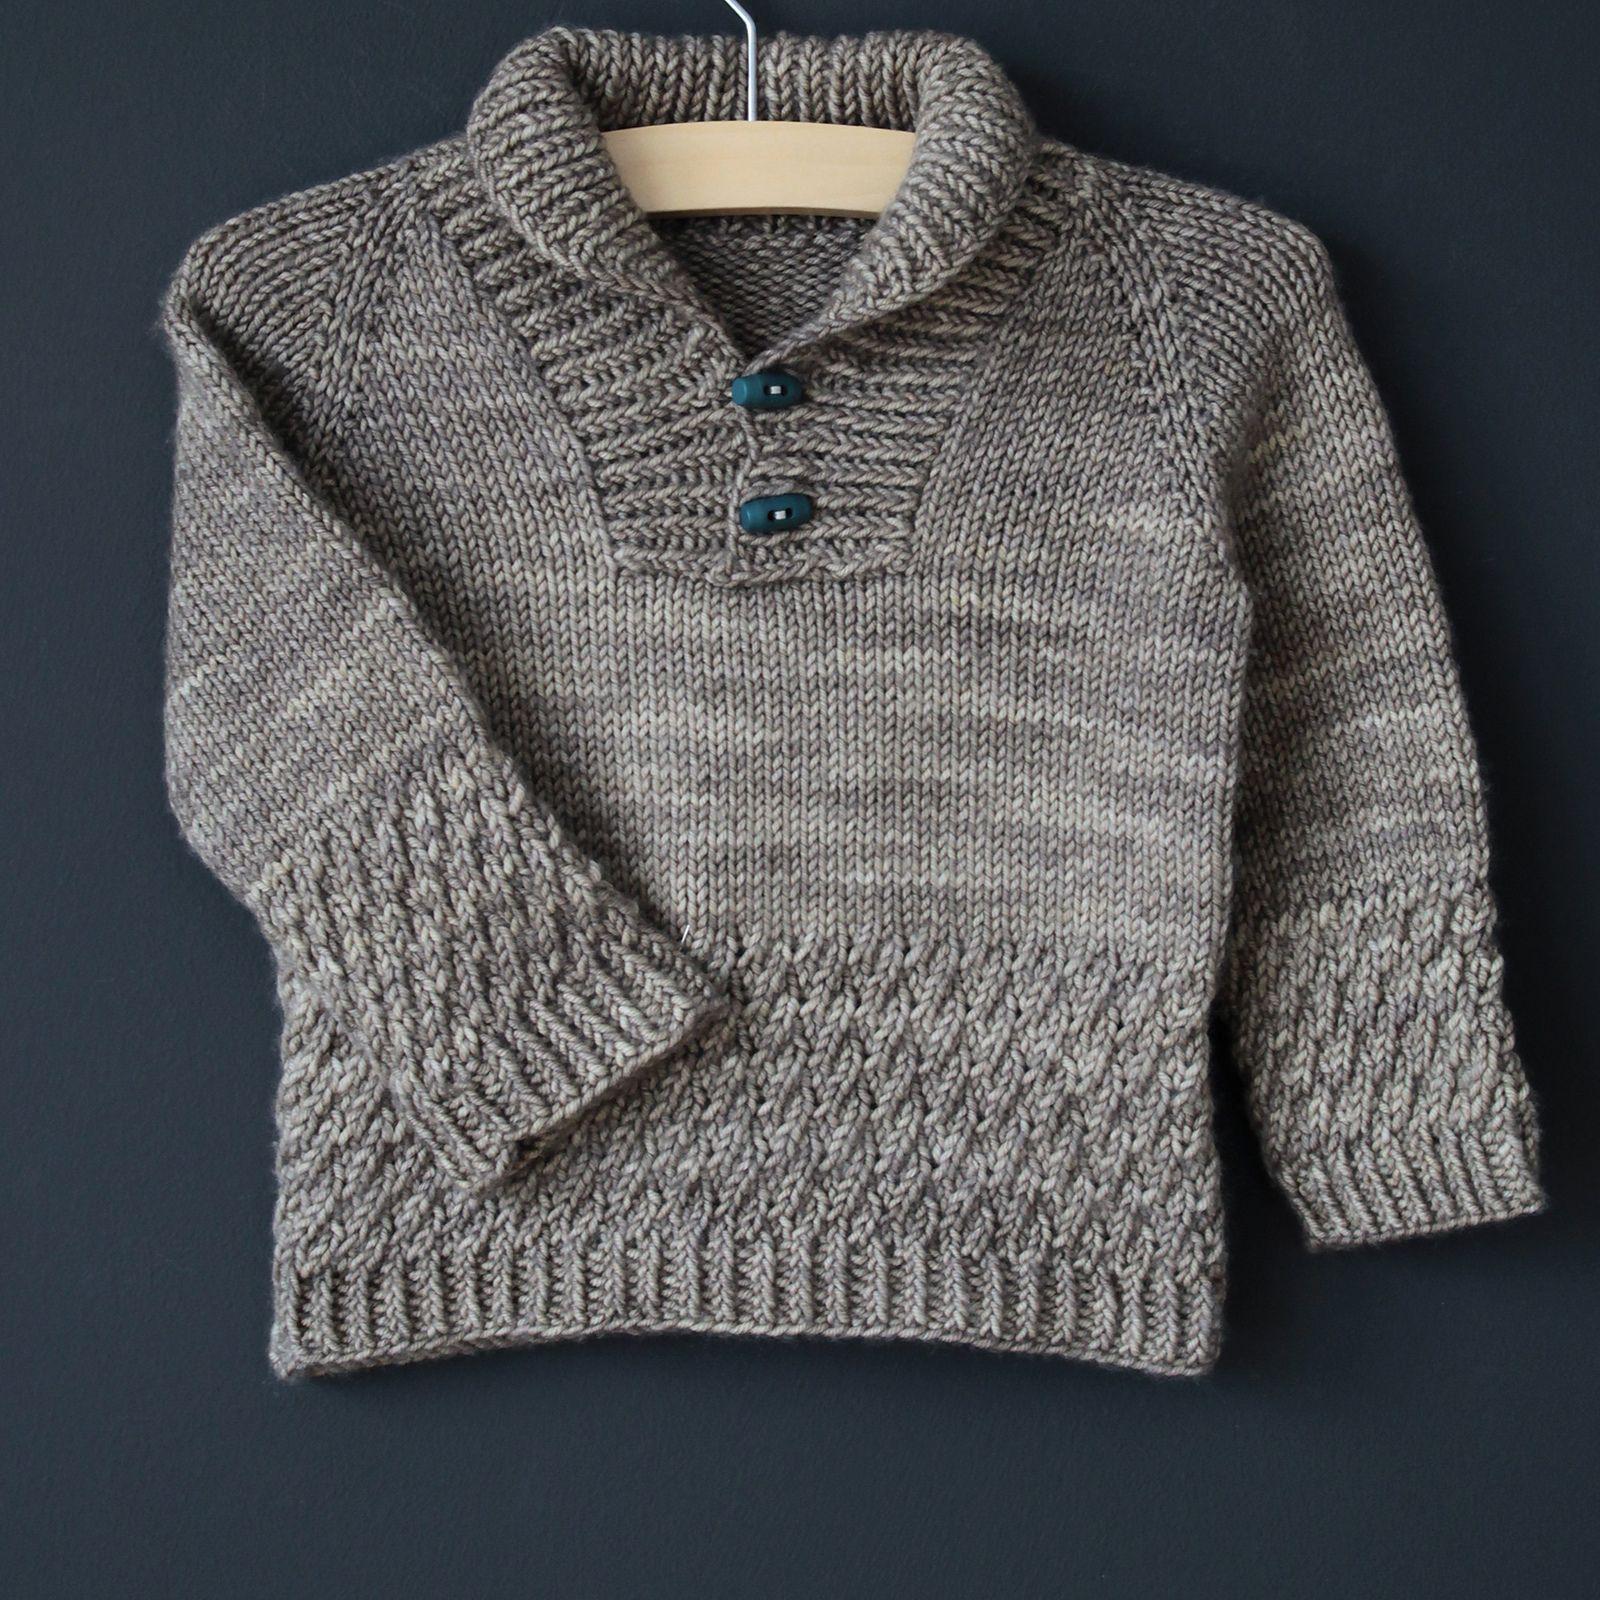 Boy Sweater pattern by Lisa Chemery   Boys sweaters ...